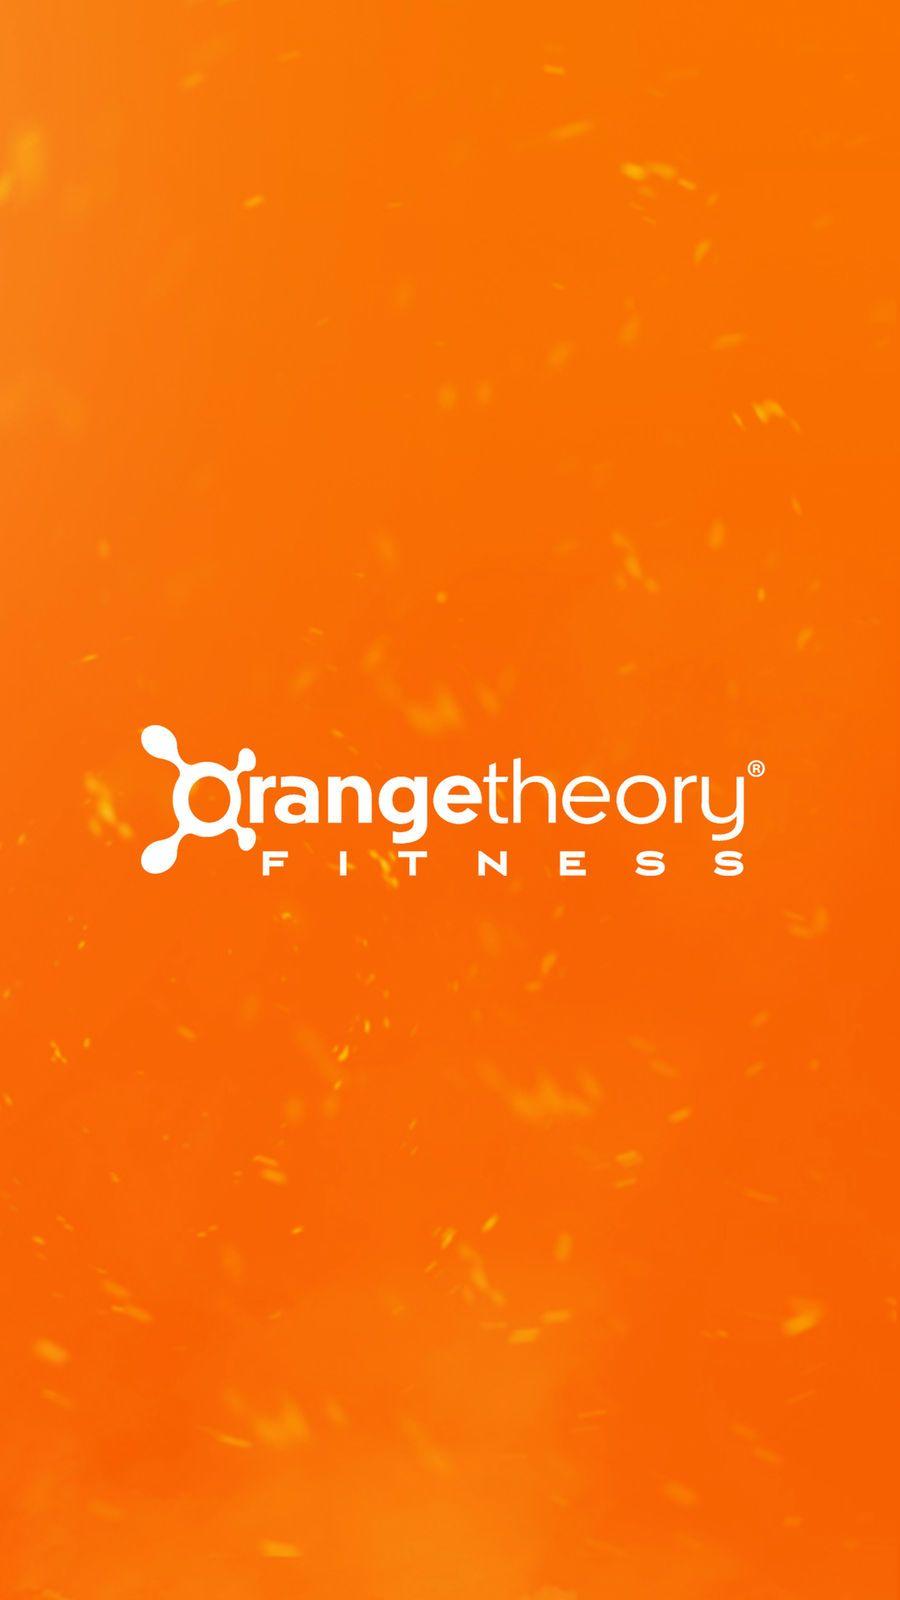 Orangetheory Fitness Booking #Lifestyle#amp#apps#ios